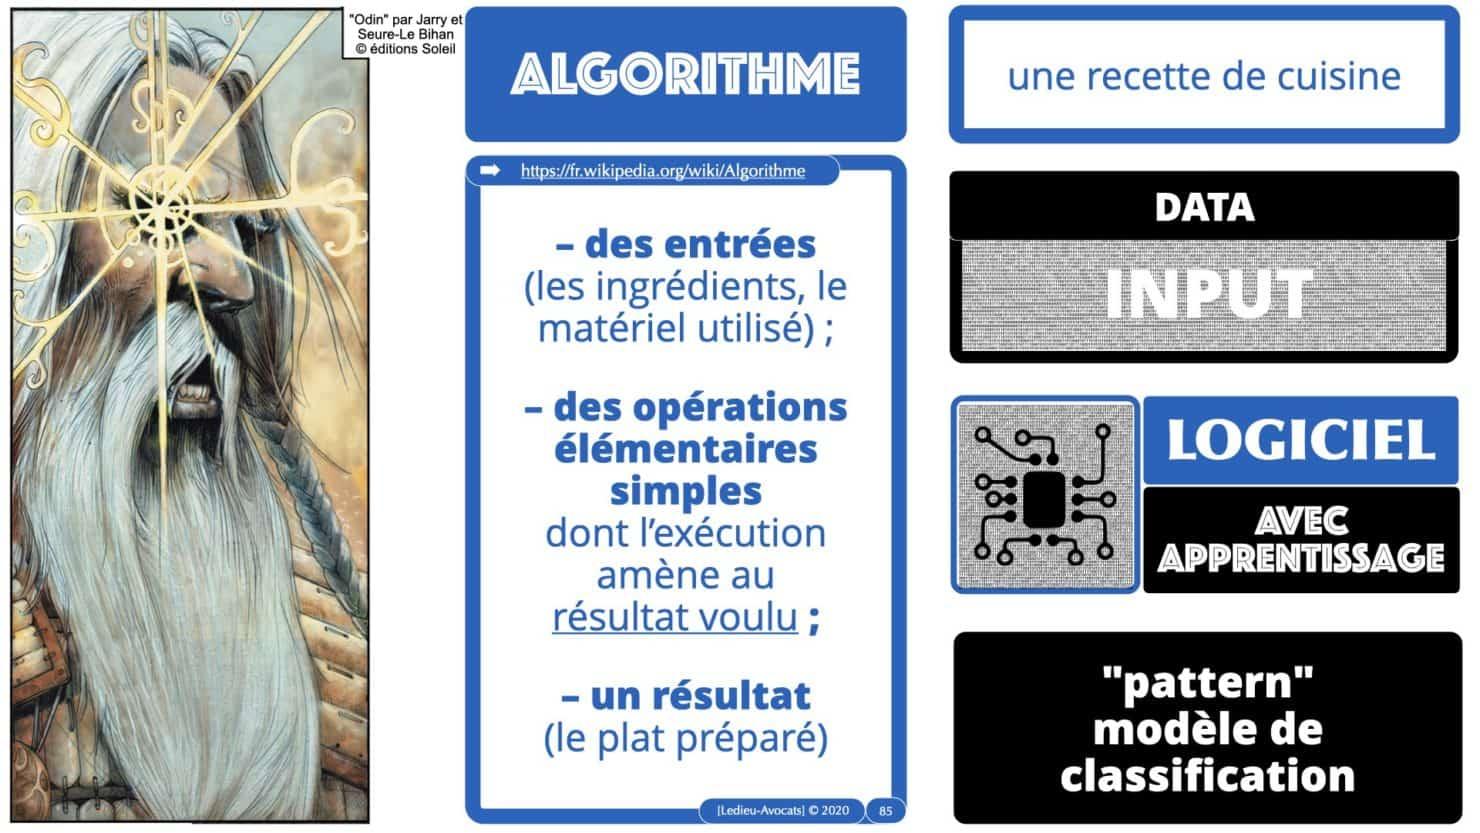 307 Intelligence artificielle-machine-learning-deep-learning-base de données-BIG-DATA *16:9* Constellation ©Ledieu-Avocat-13-10-2020.085